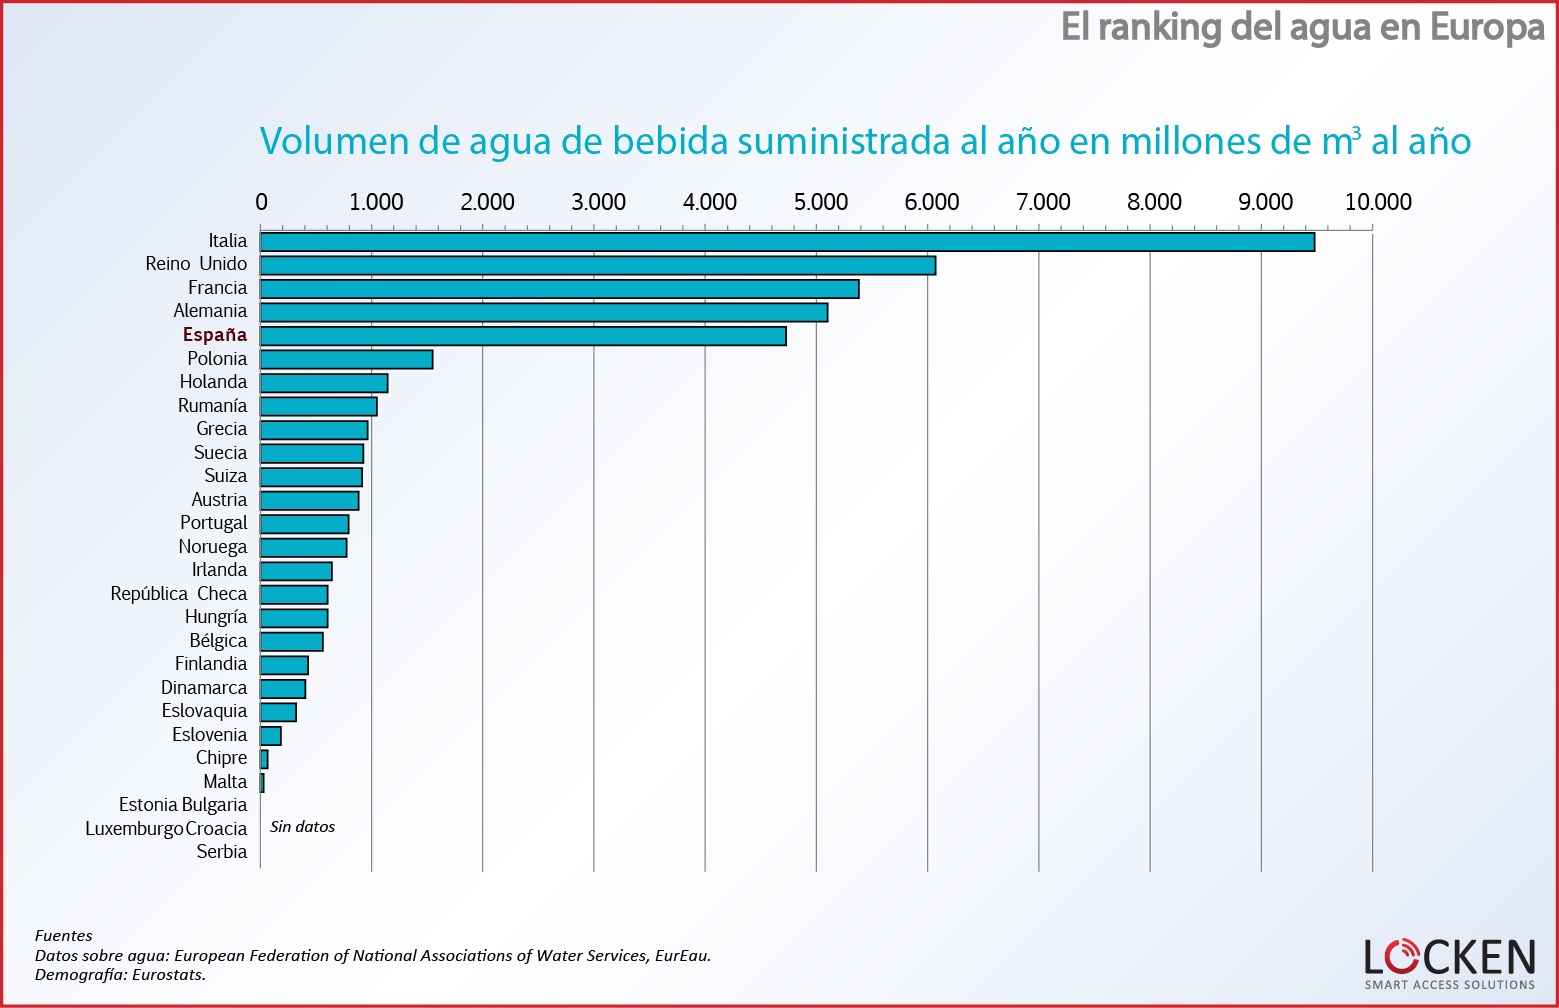 ranking-agua-europa-volumen-suministrado